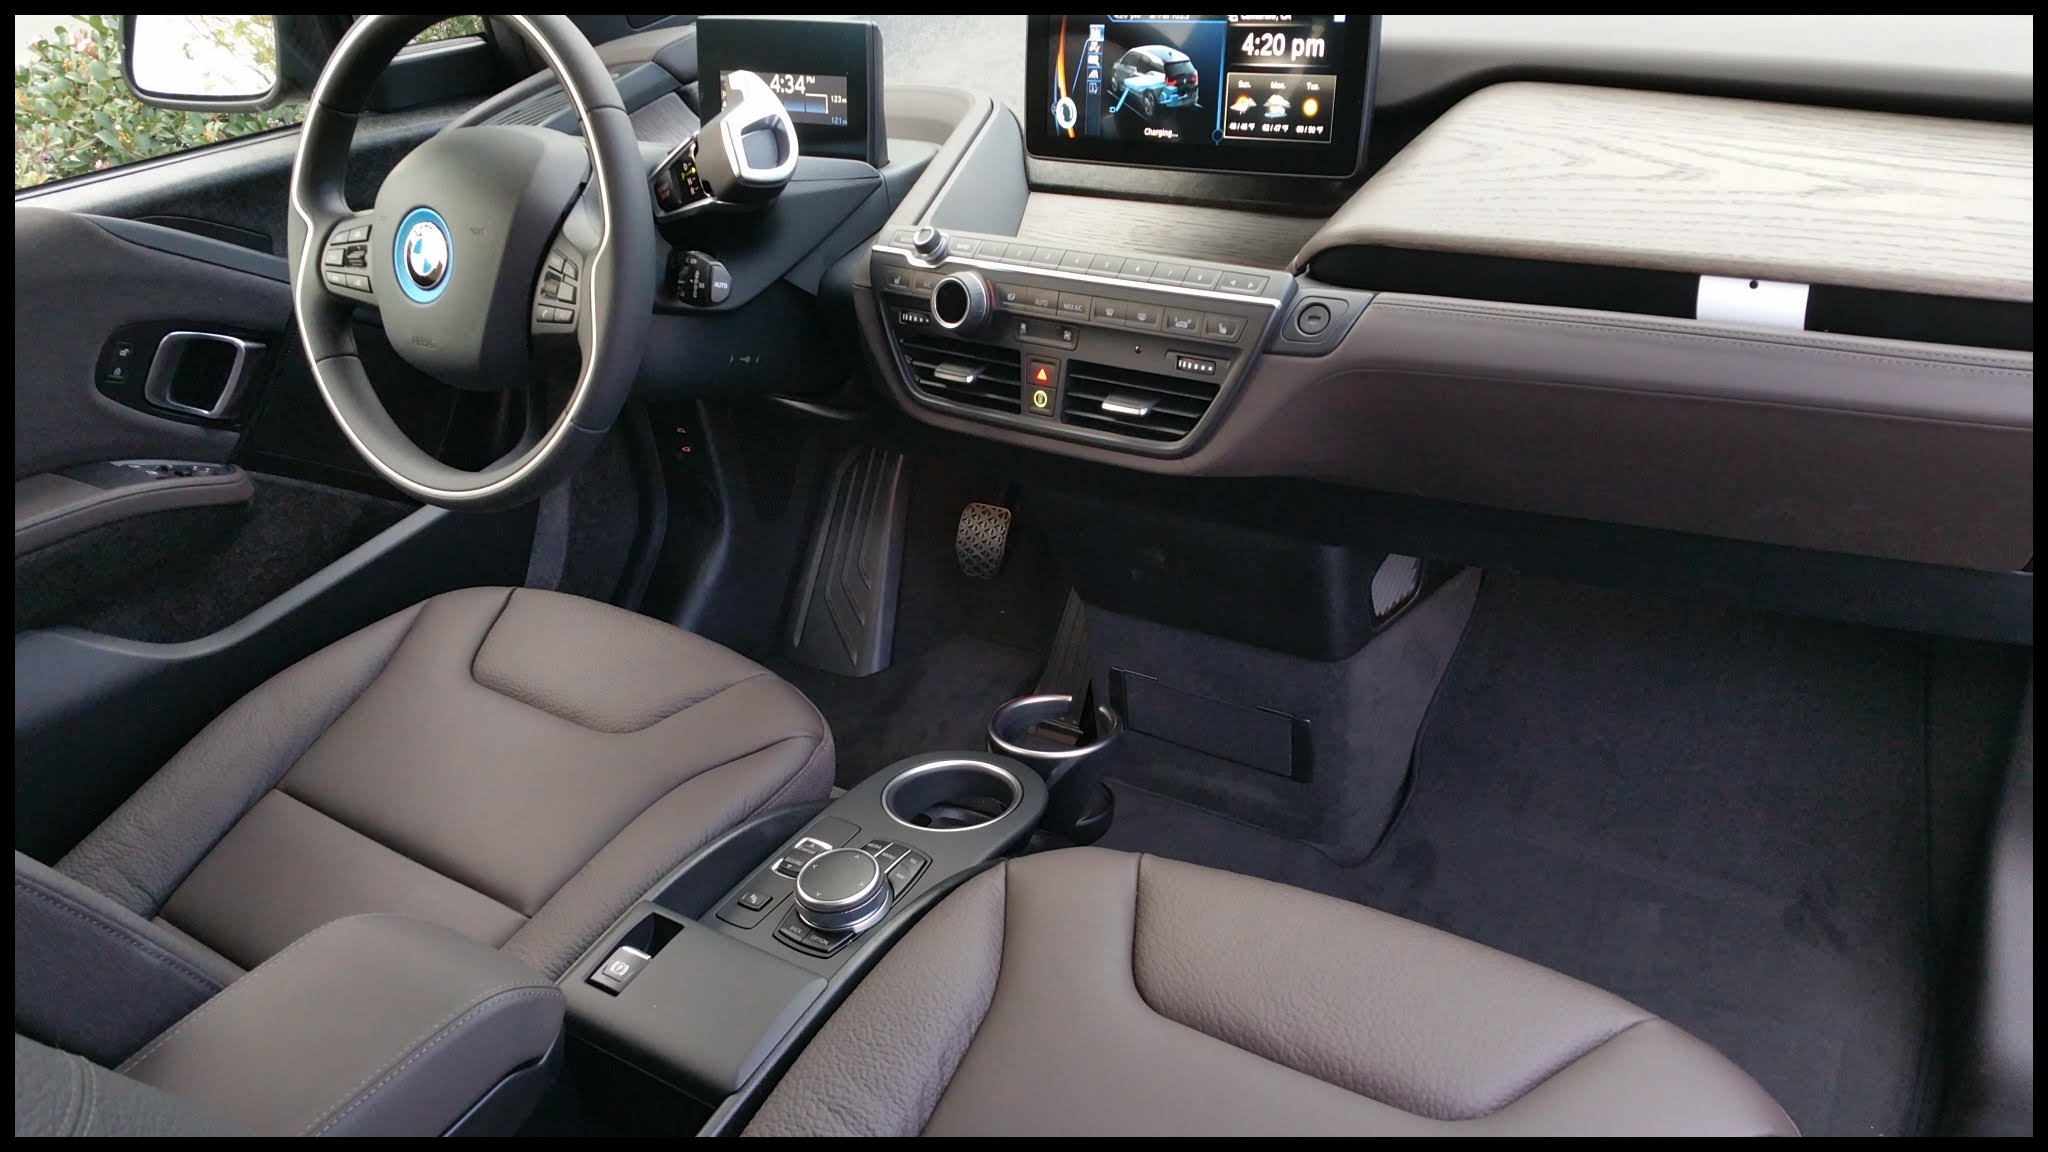 2017 BMW i3 33 kwh Terra interior via warren m